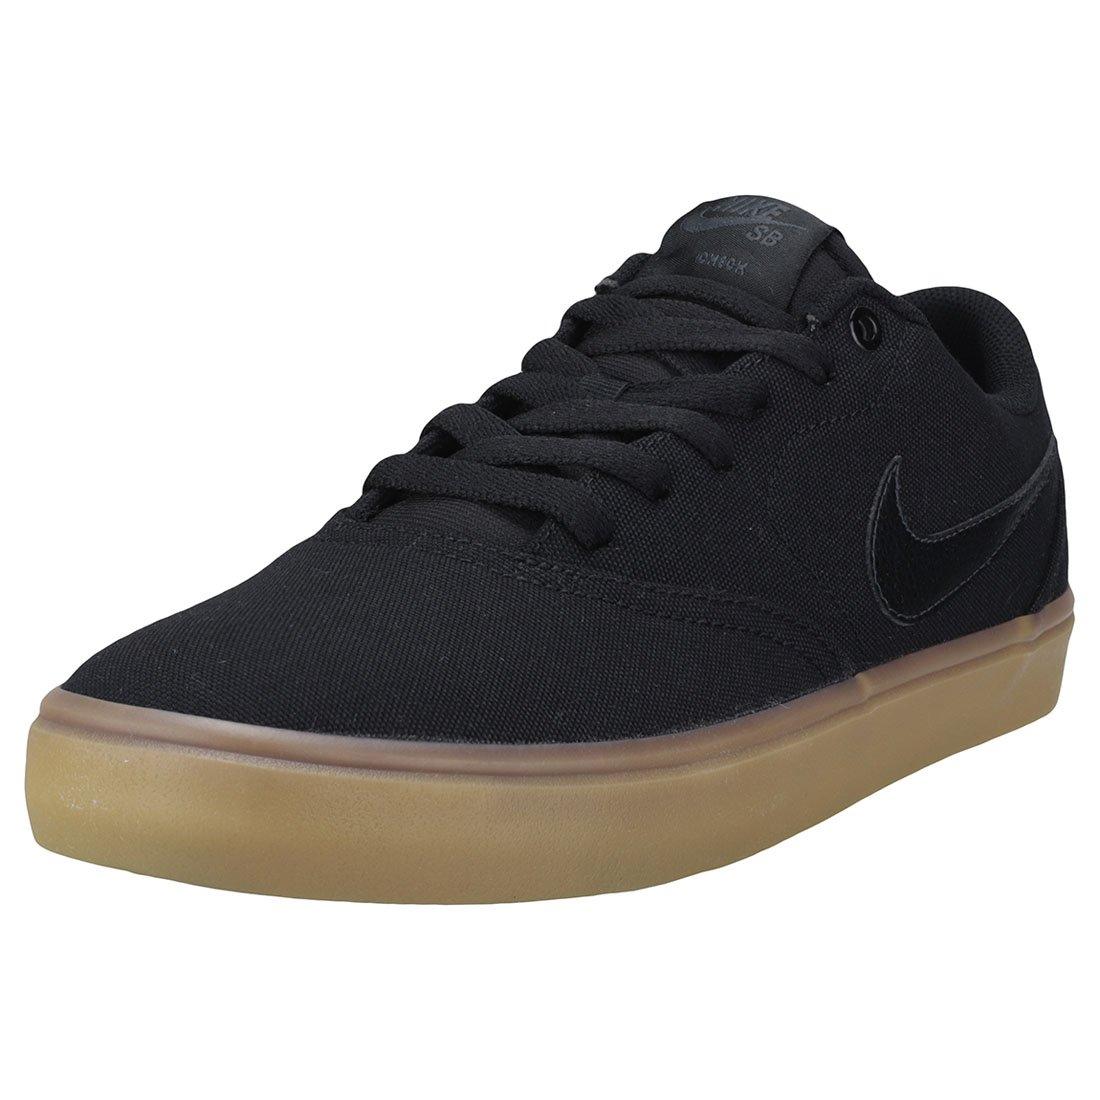 Galleon - Nike Men s SB Check Solarsoft Canvas Skateboarding Shoes  Black Black-Gum Light Brown 8.5 2b036eb9146